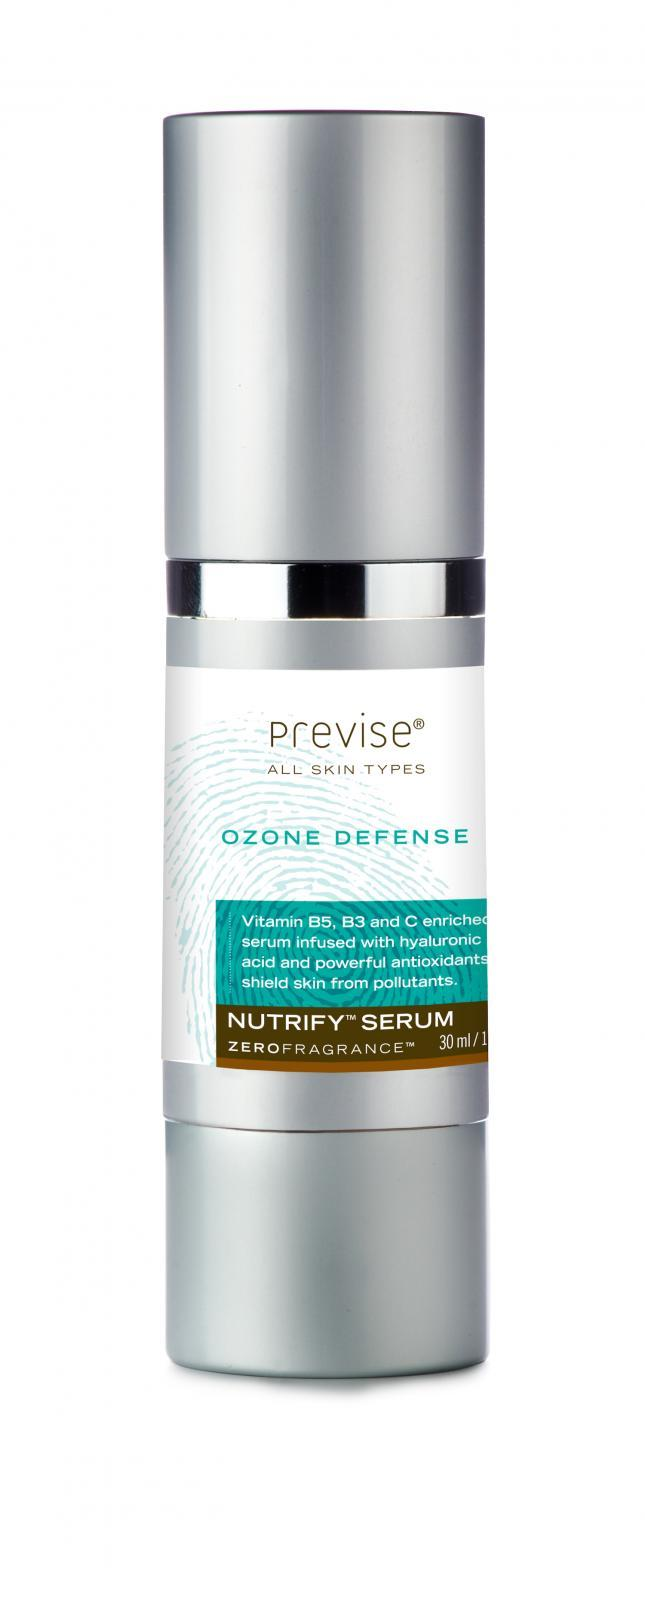 Ozone Defense Nutrify Serum